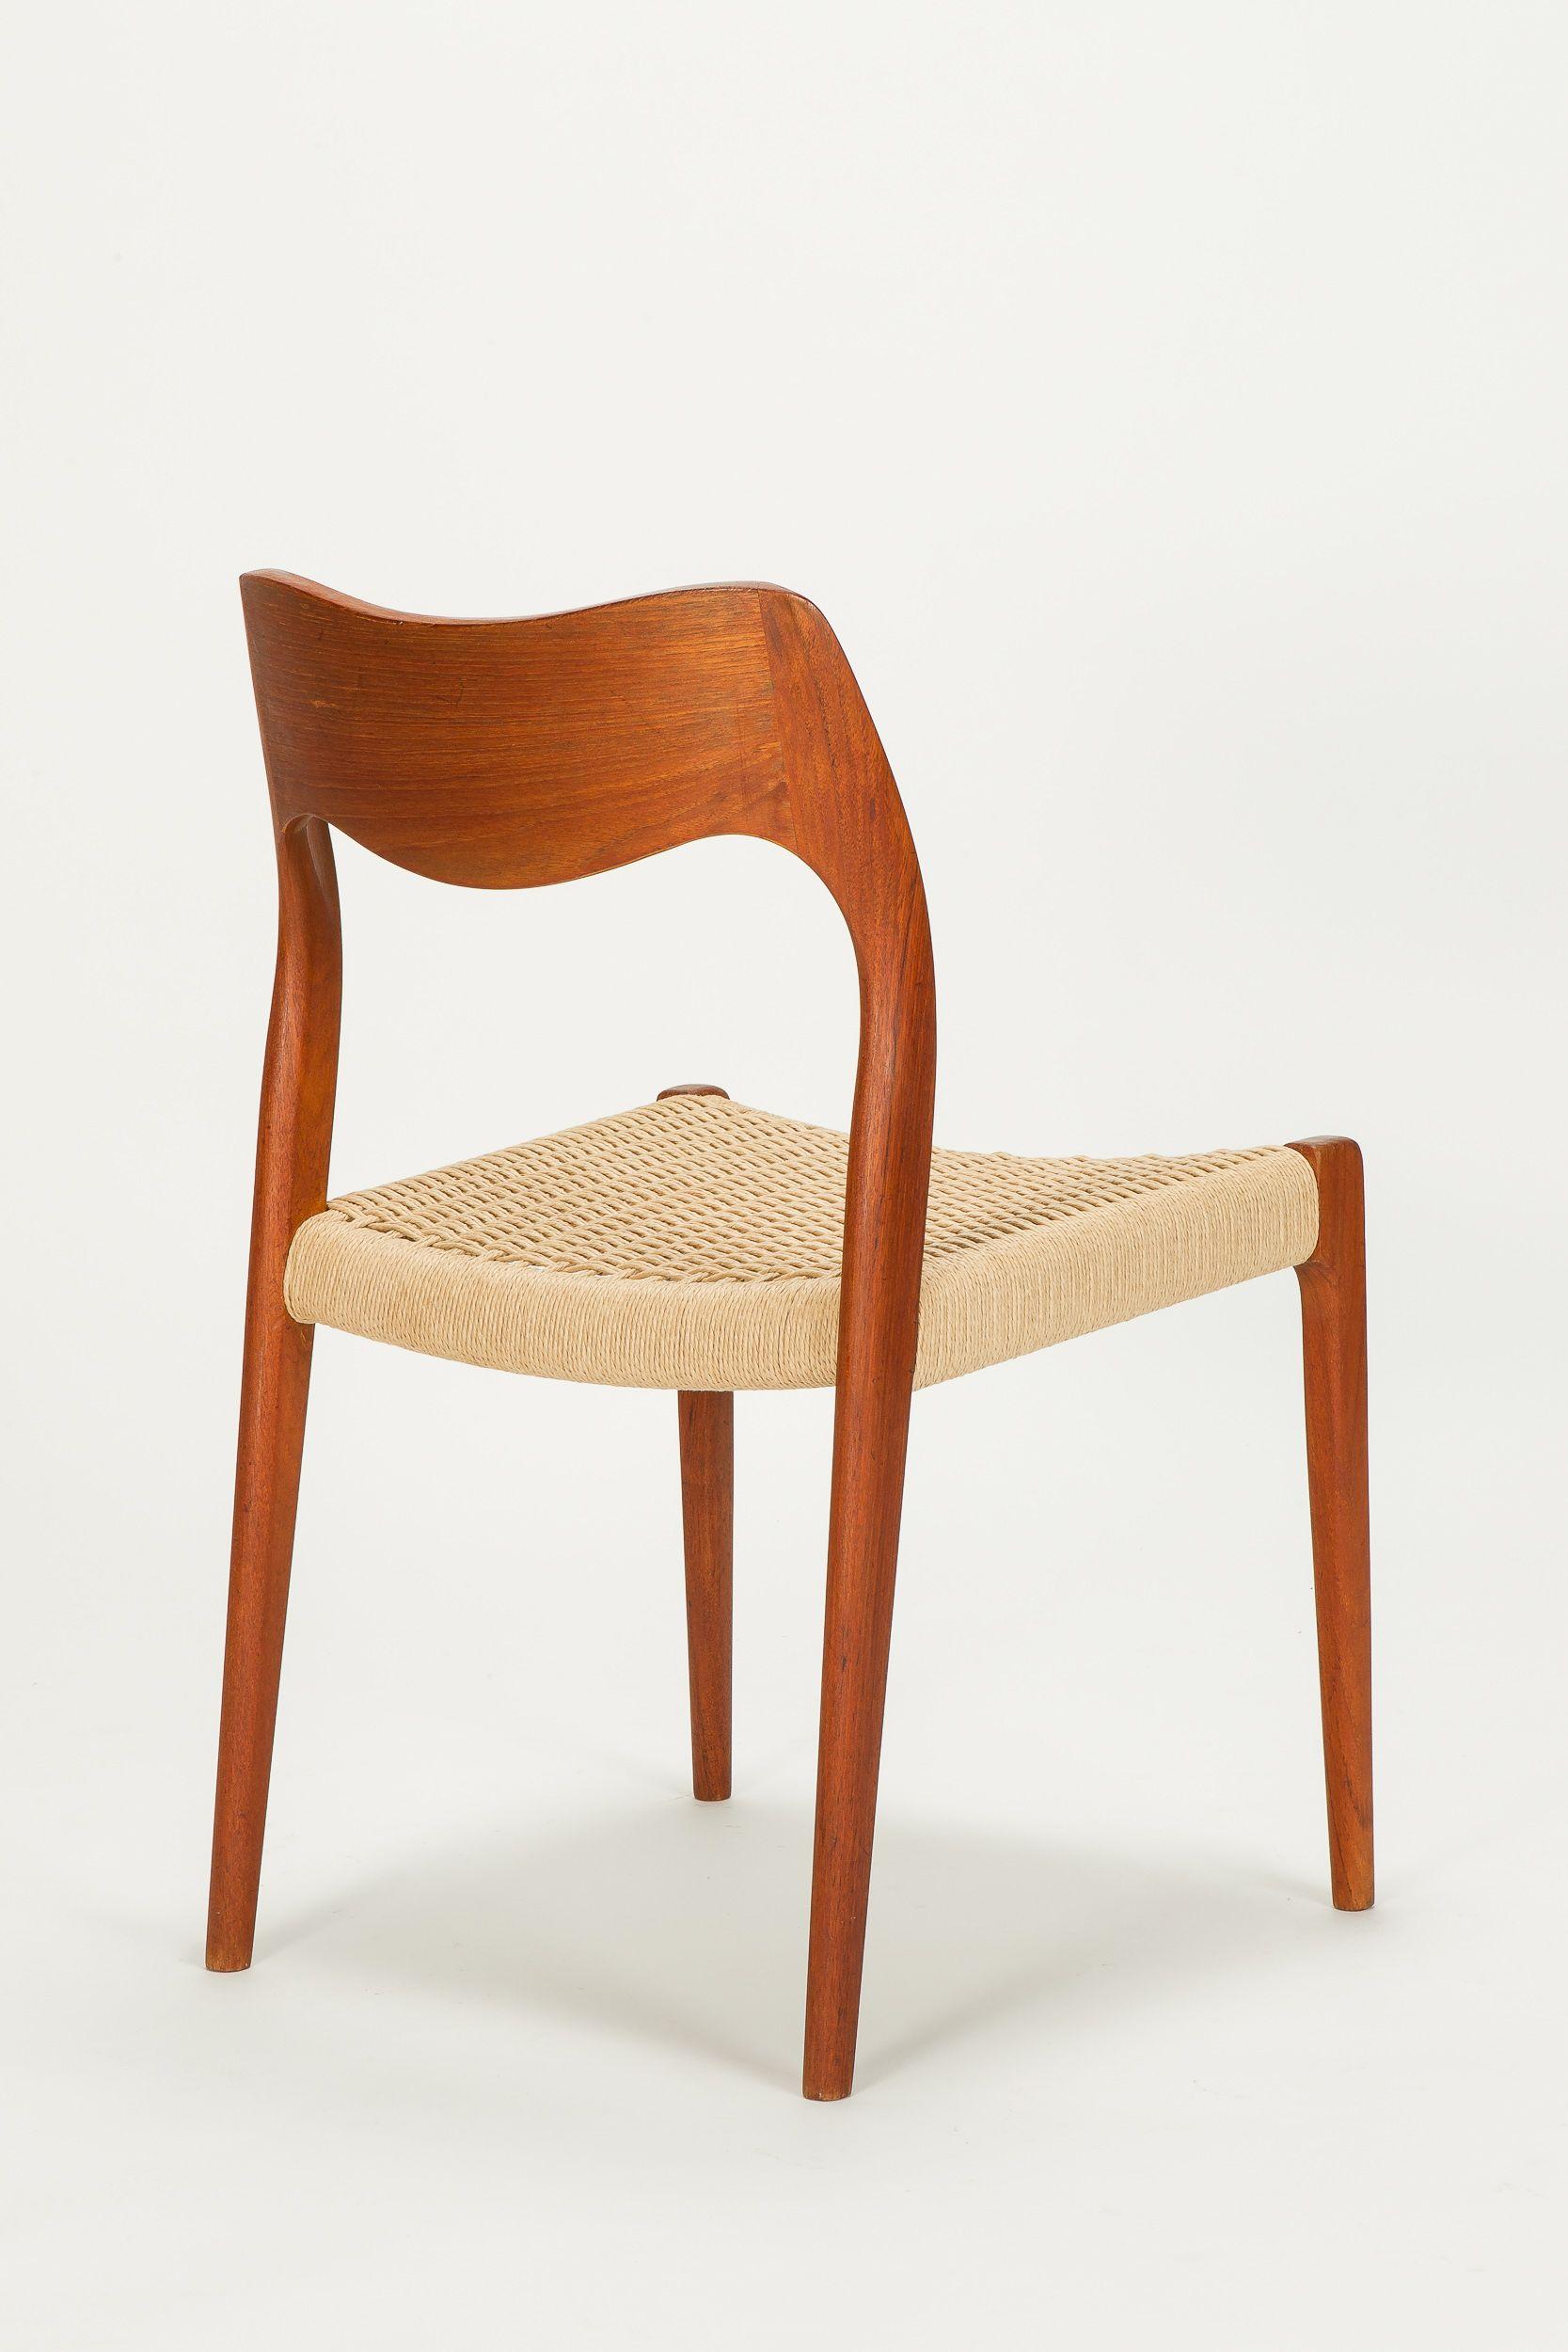 Niels O M¸ller Teak Chair No 71 for J L M¸llers M¸belfabrik 1954